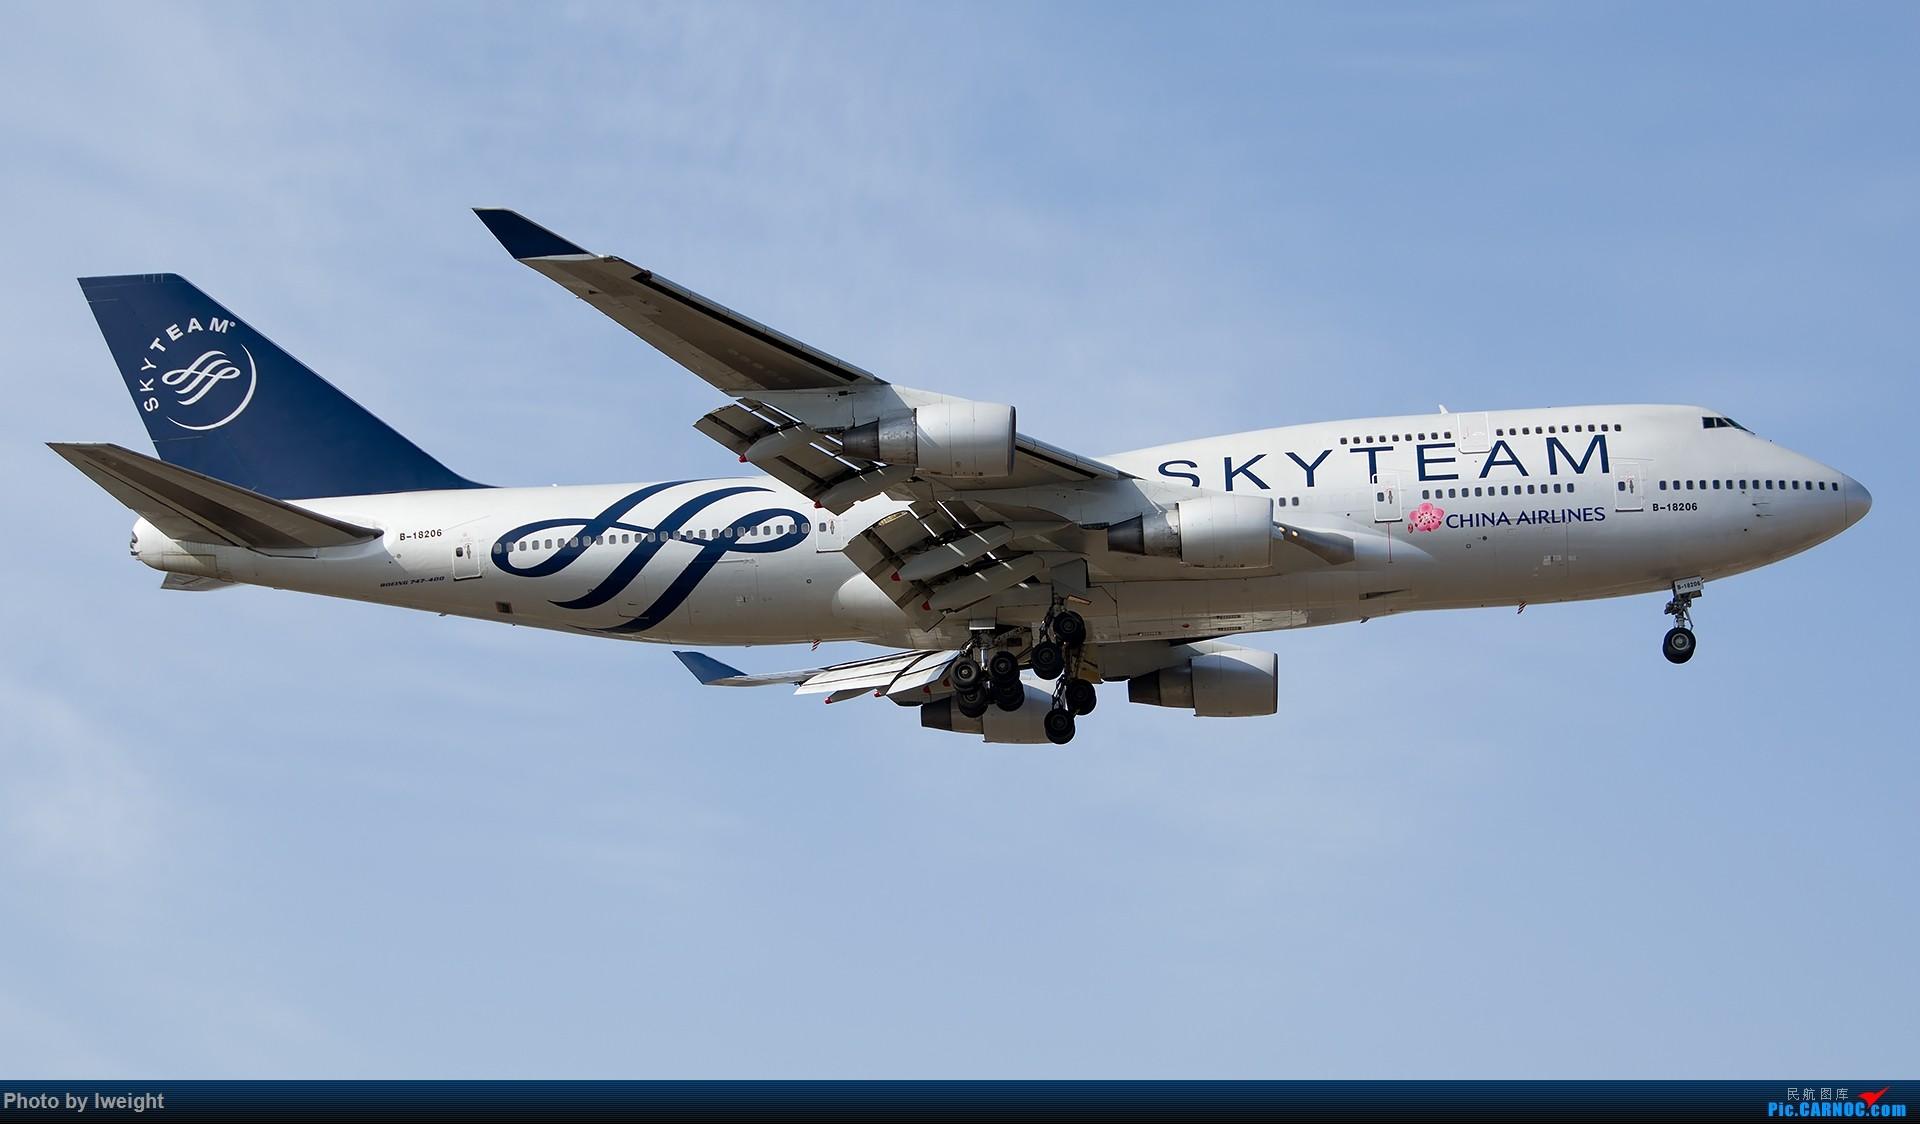 Re:[原创]羊年第一次拍机,首都机场[2015-2-23] BOEING 747-400 B-18206 中国北京首都国际机场